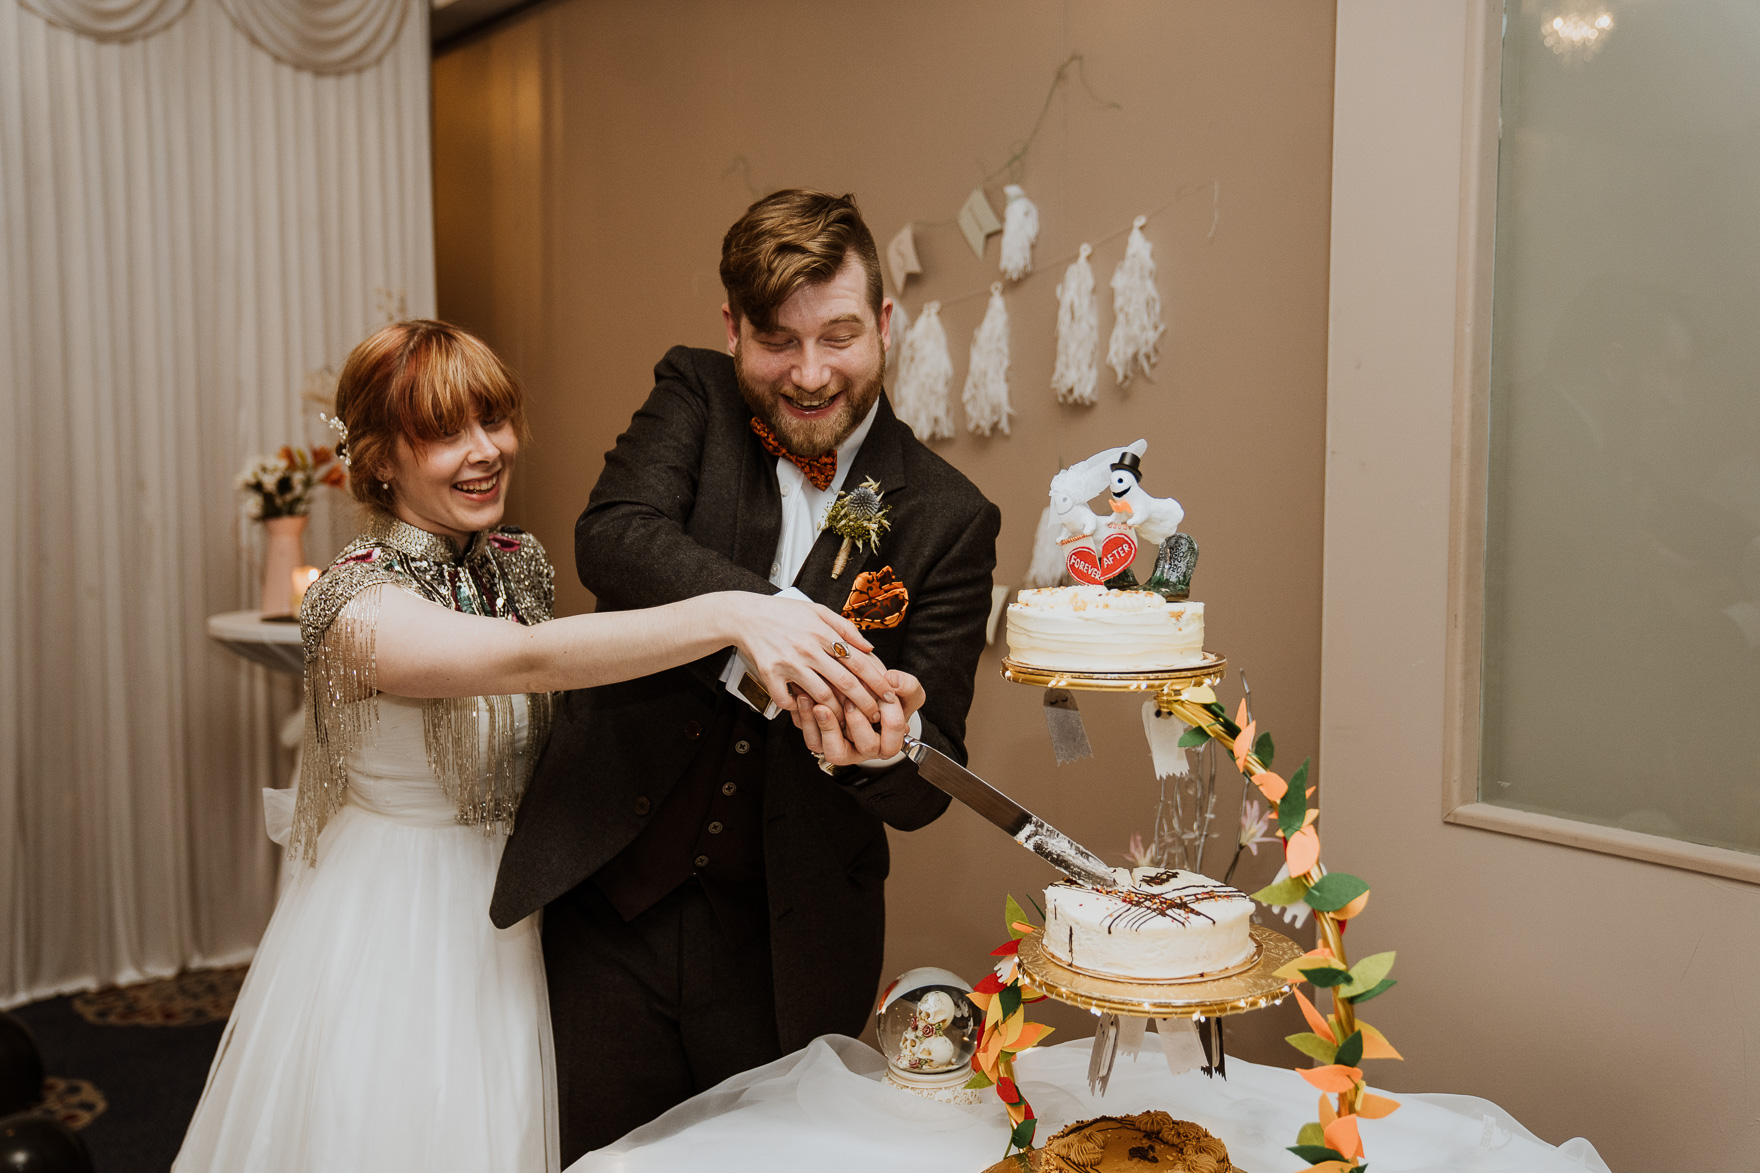 A man and a woman cutting a wedding cake